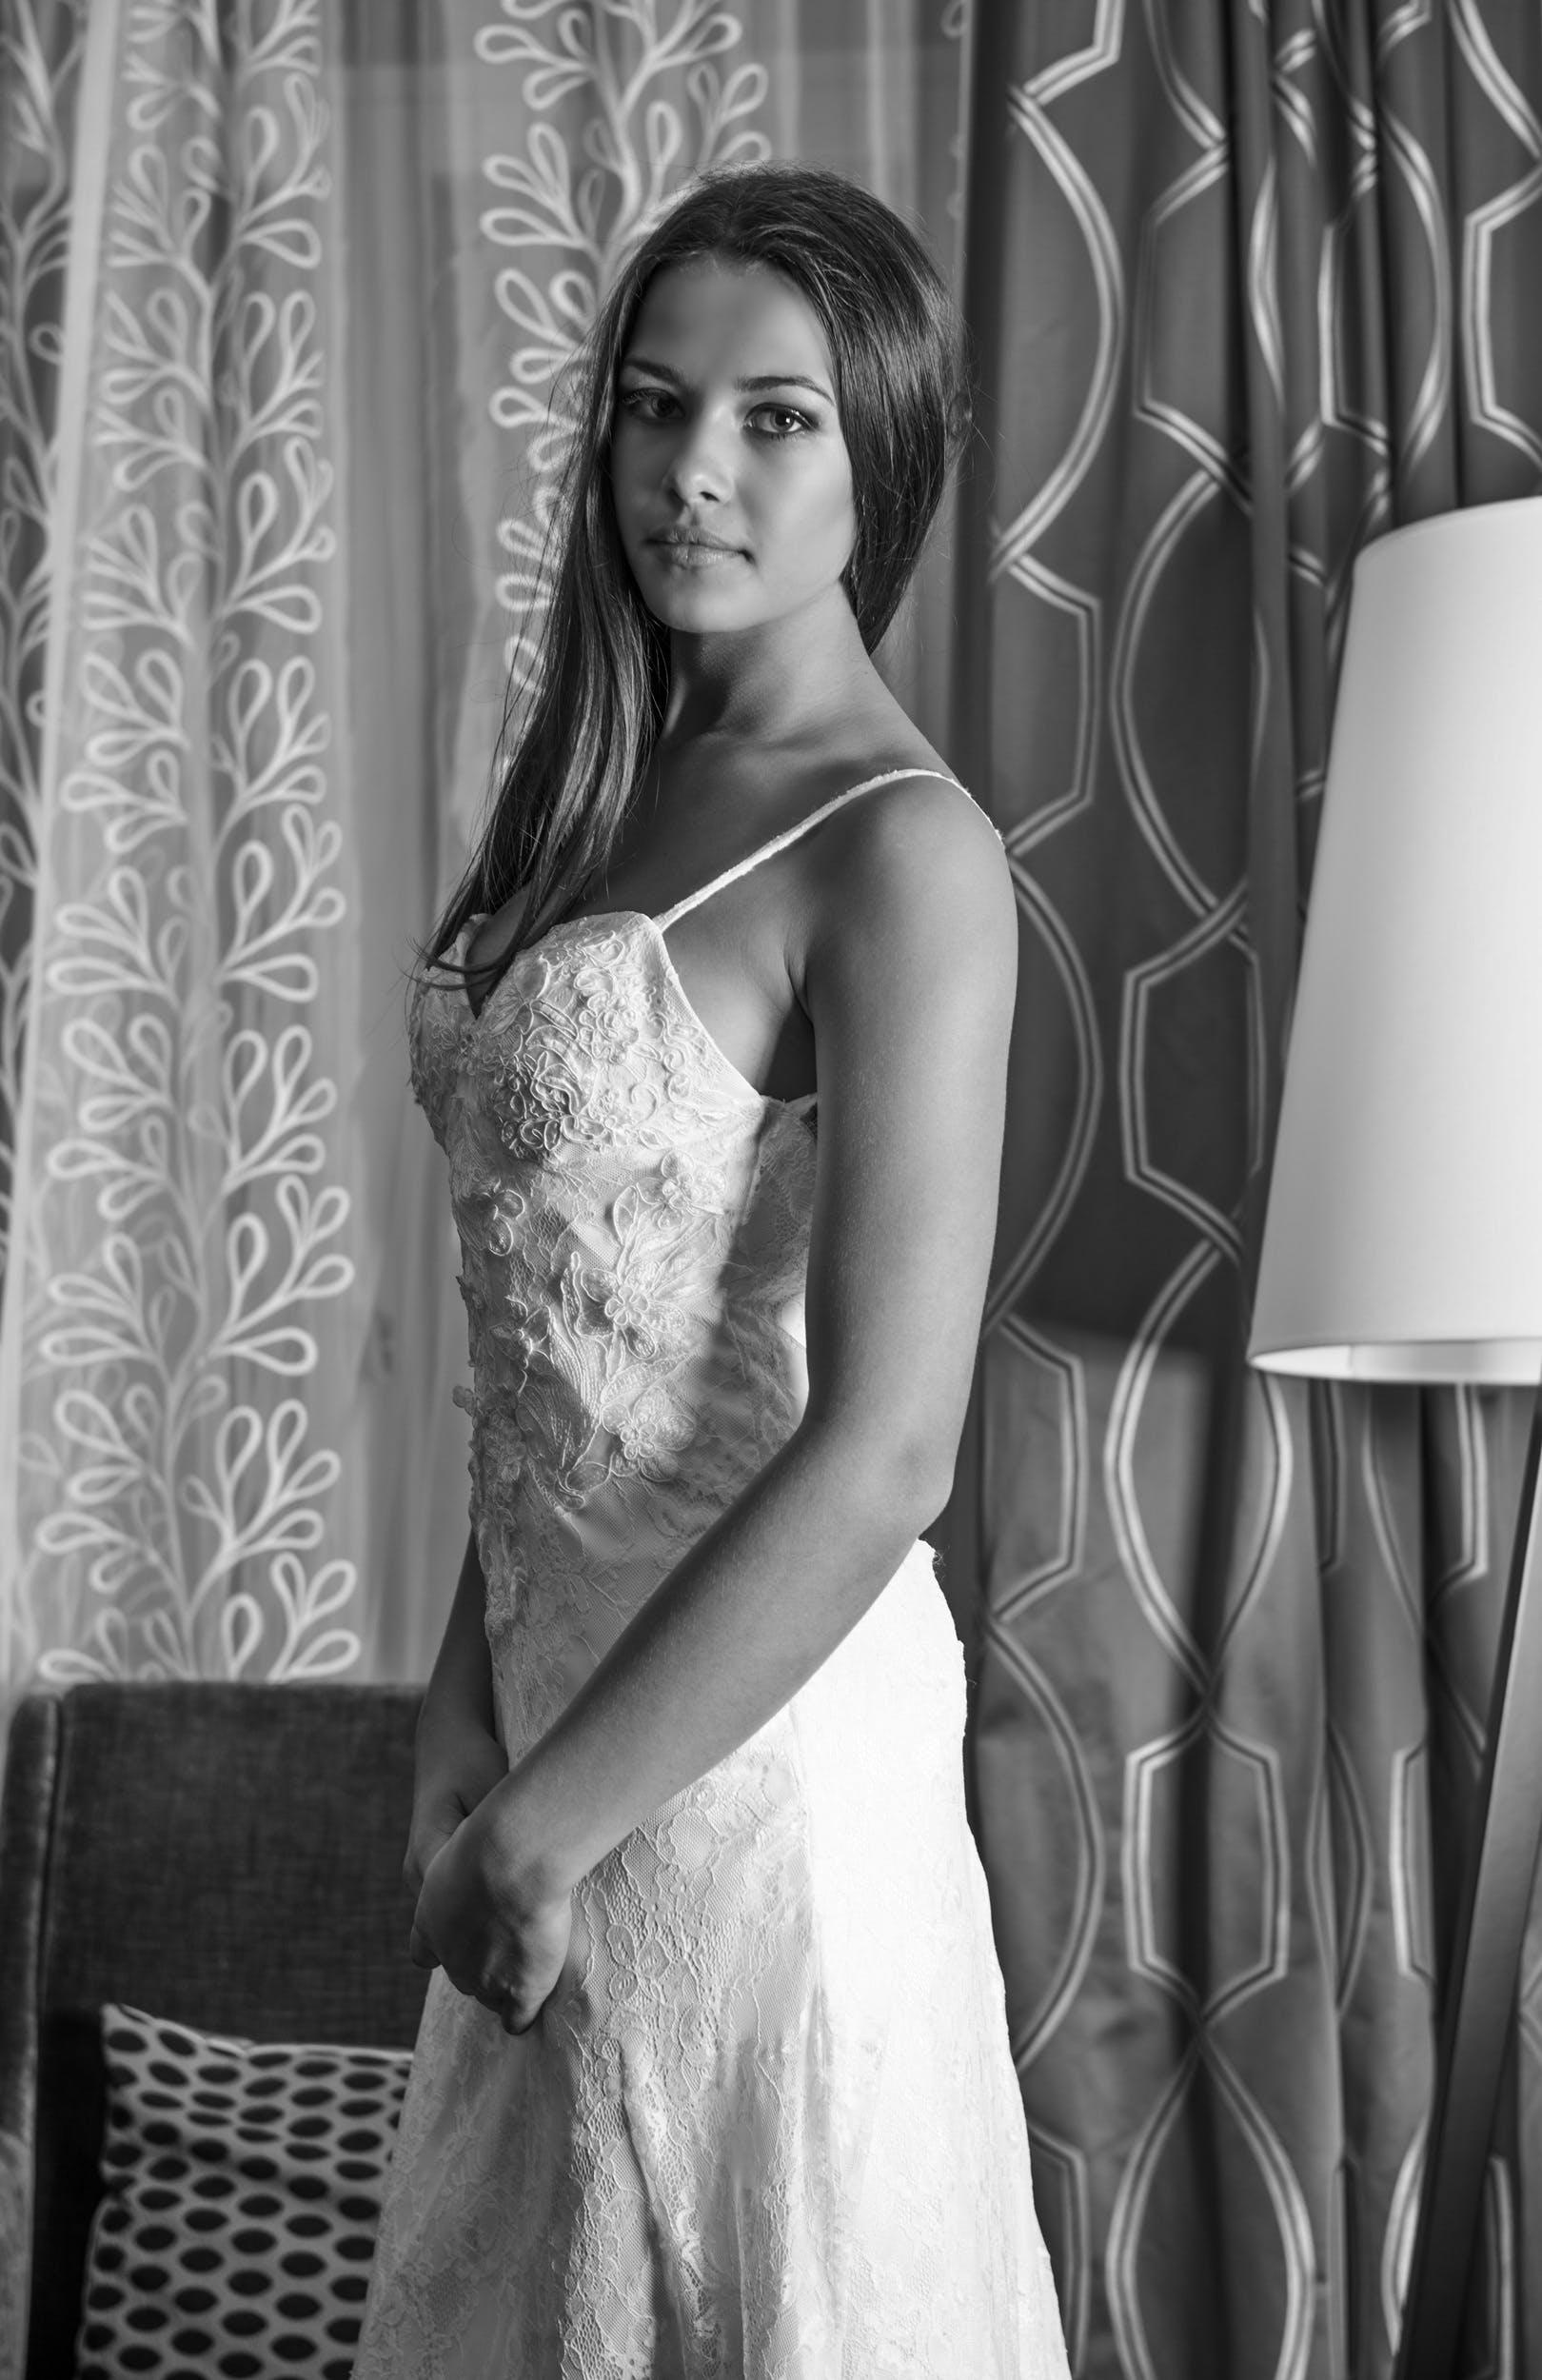 Kostenloses Stock Foto zu elegant, fashion, frau, hübsch